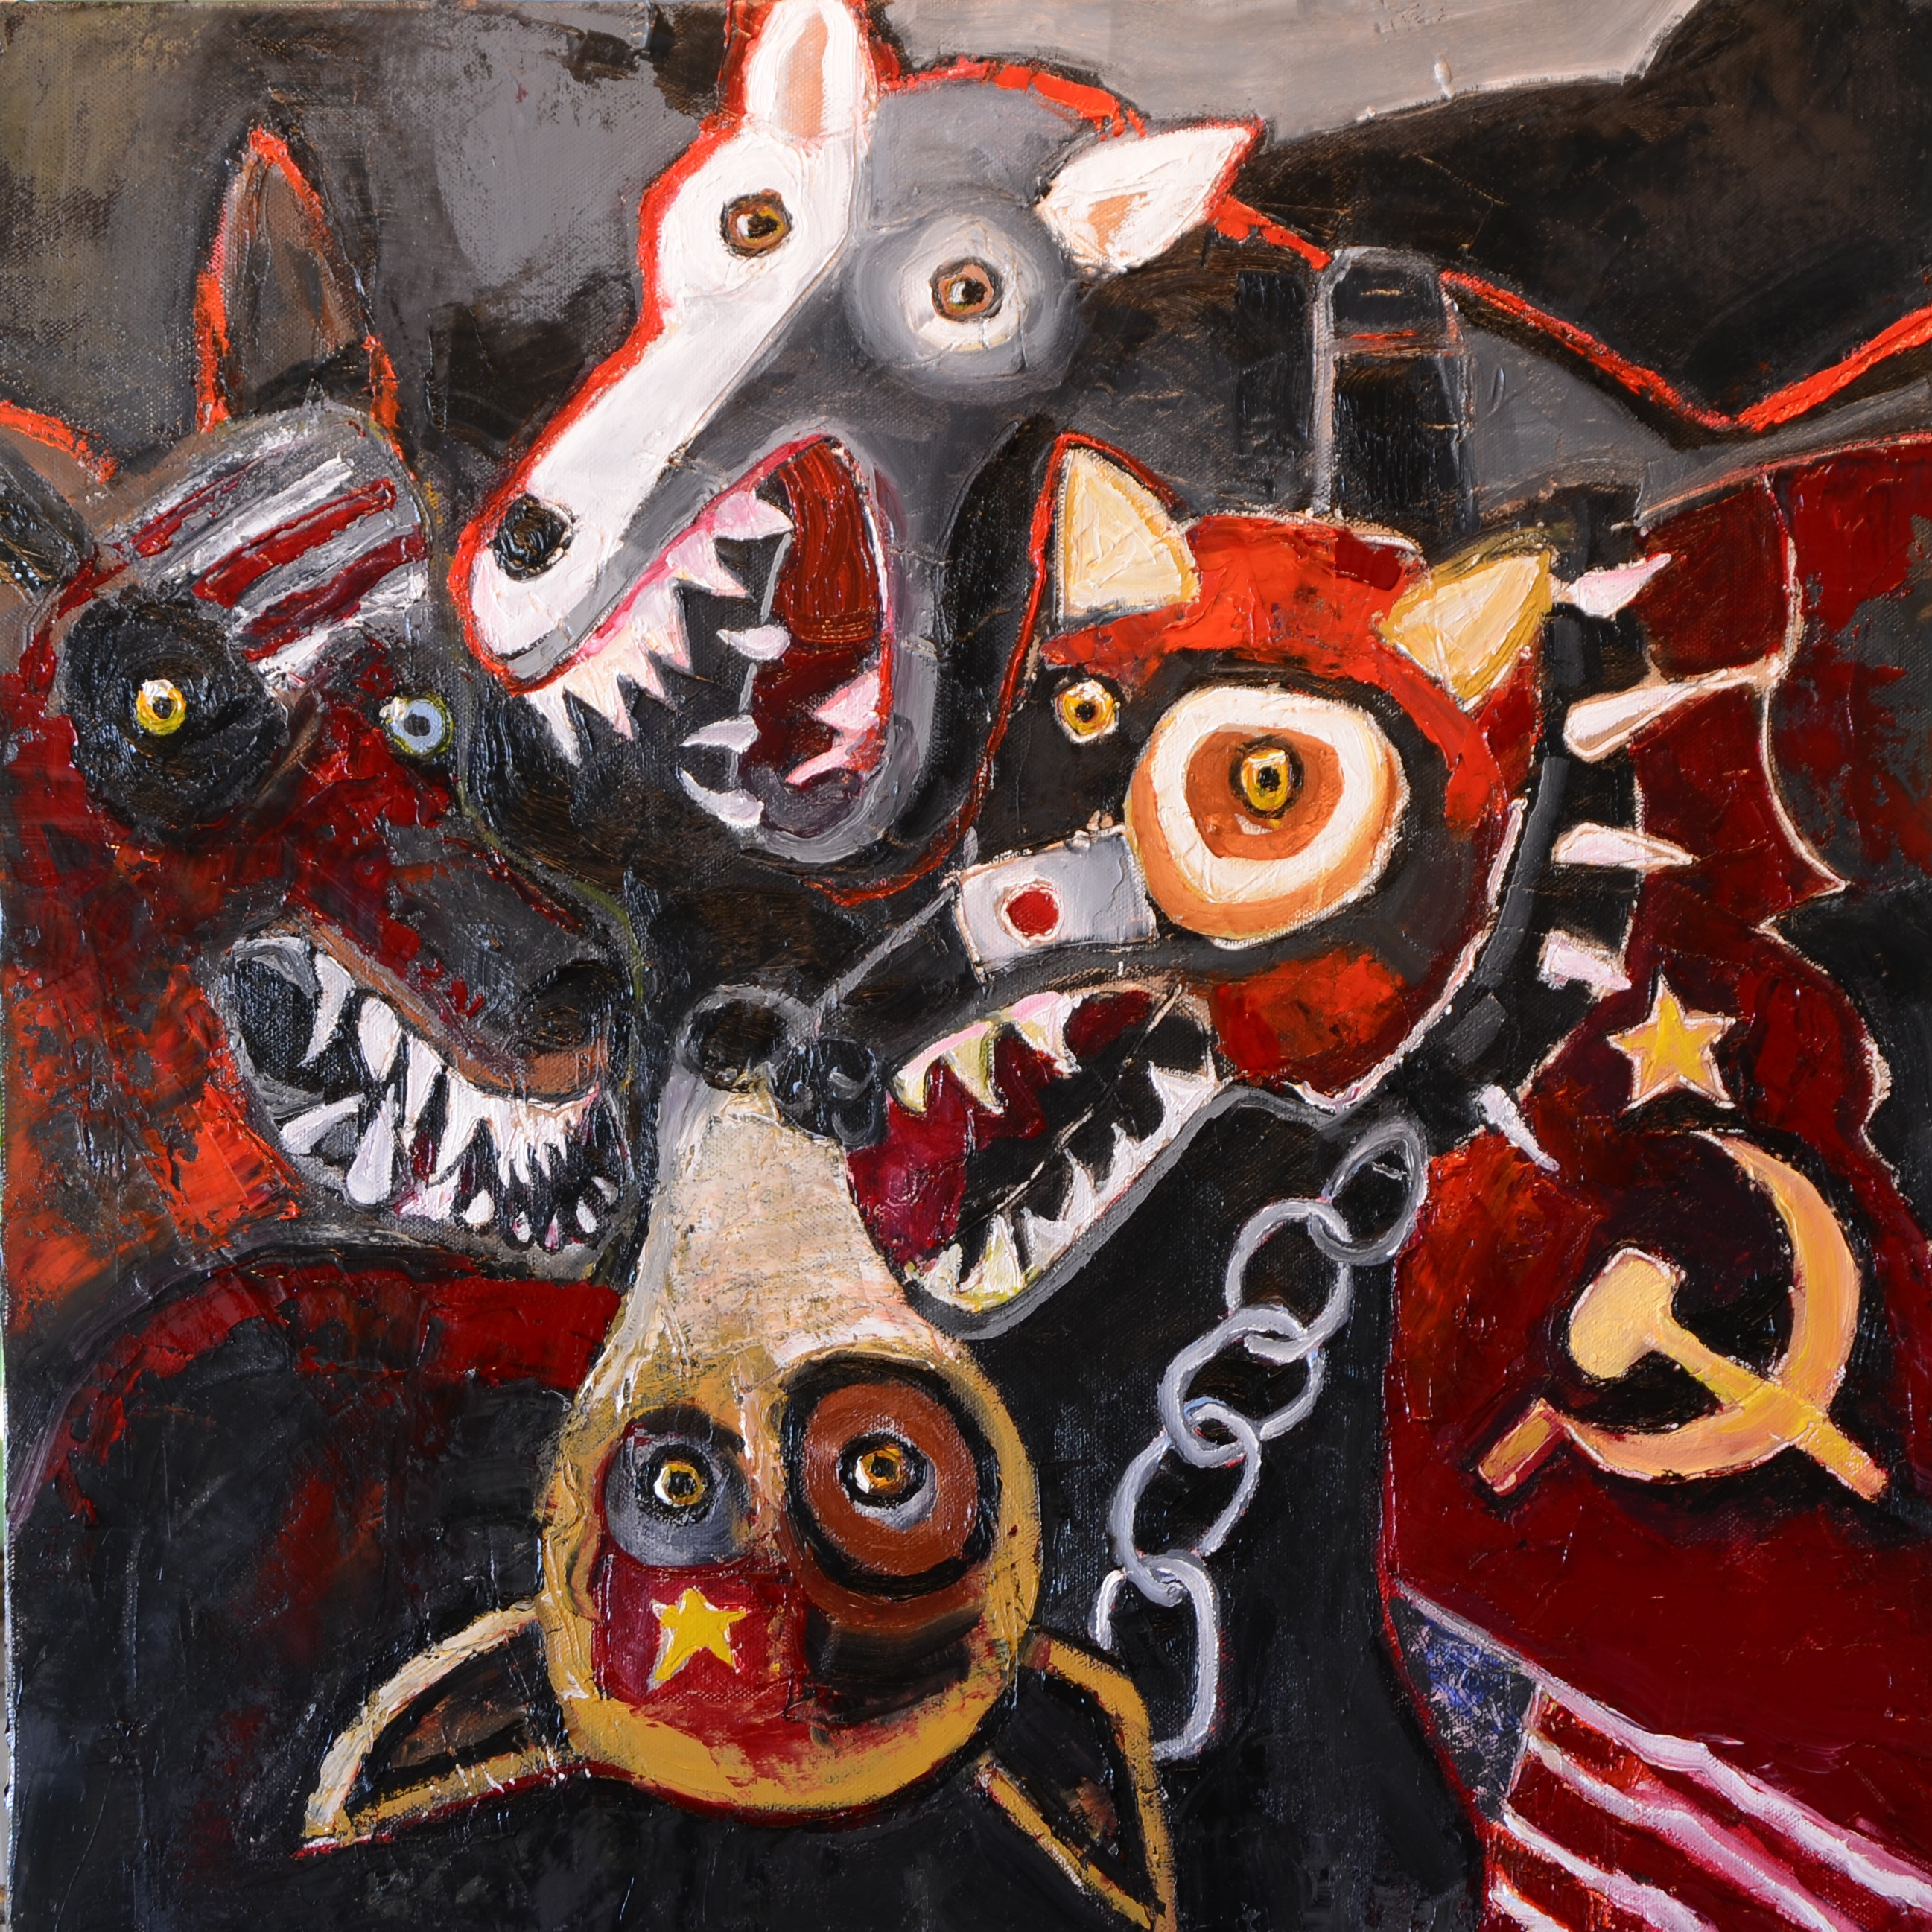 Patrick Brown artist